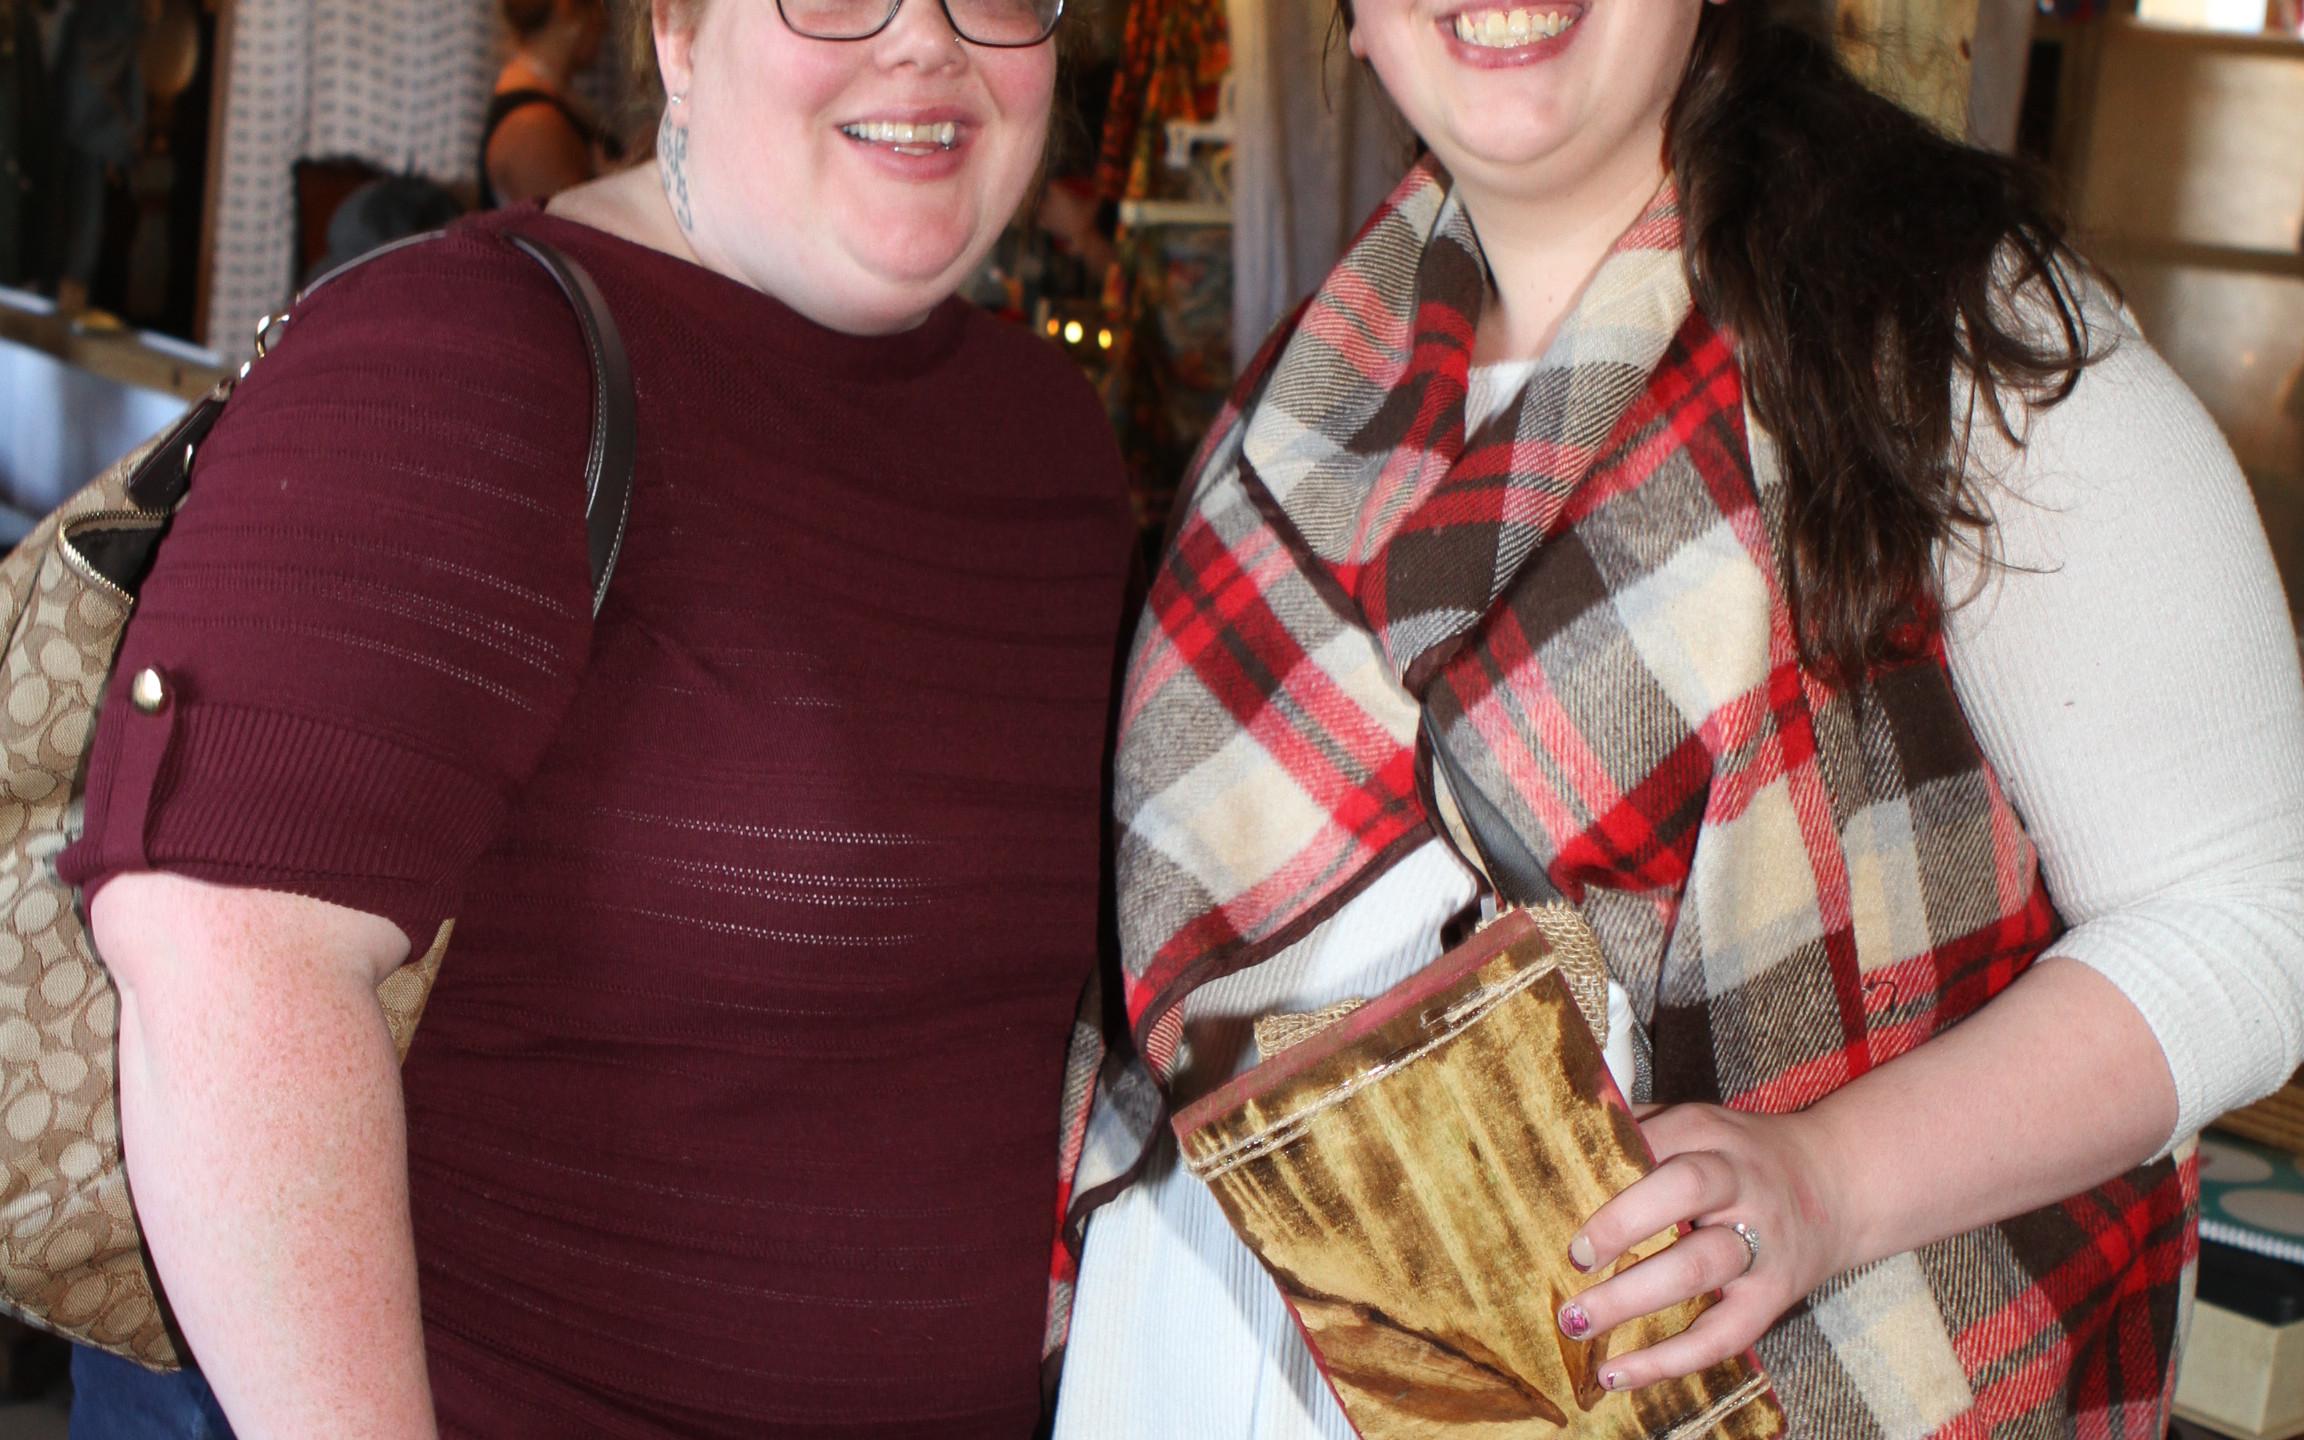 Amanda & Erin Dalrymple